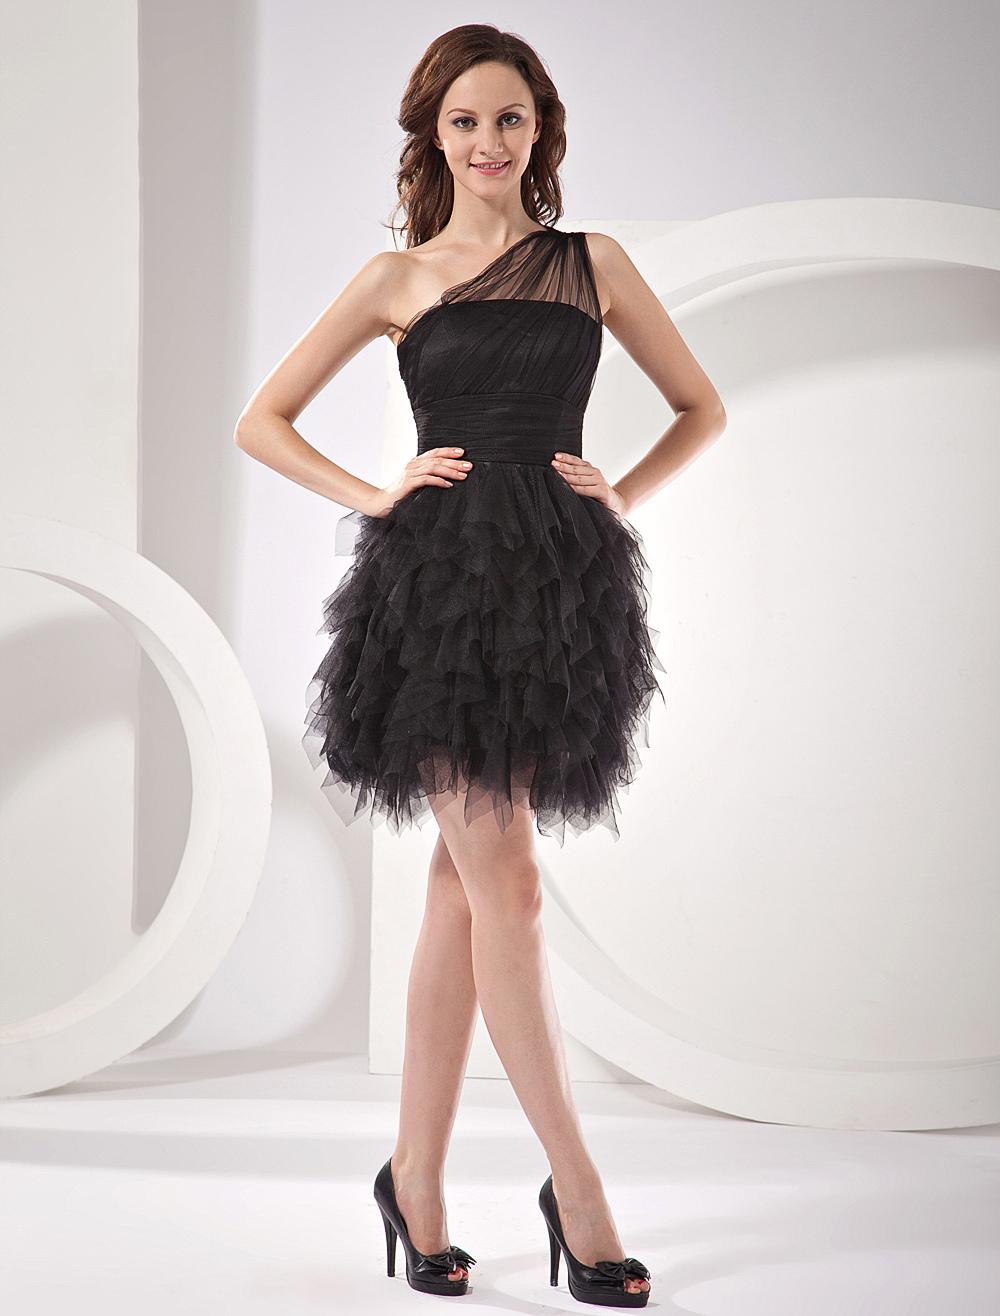 Black One-Shoulder Layered Knee Length Net Cocktail Dress (Wedding) photo